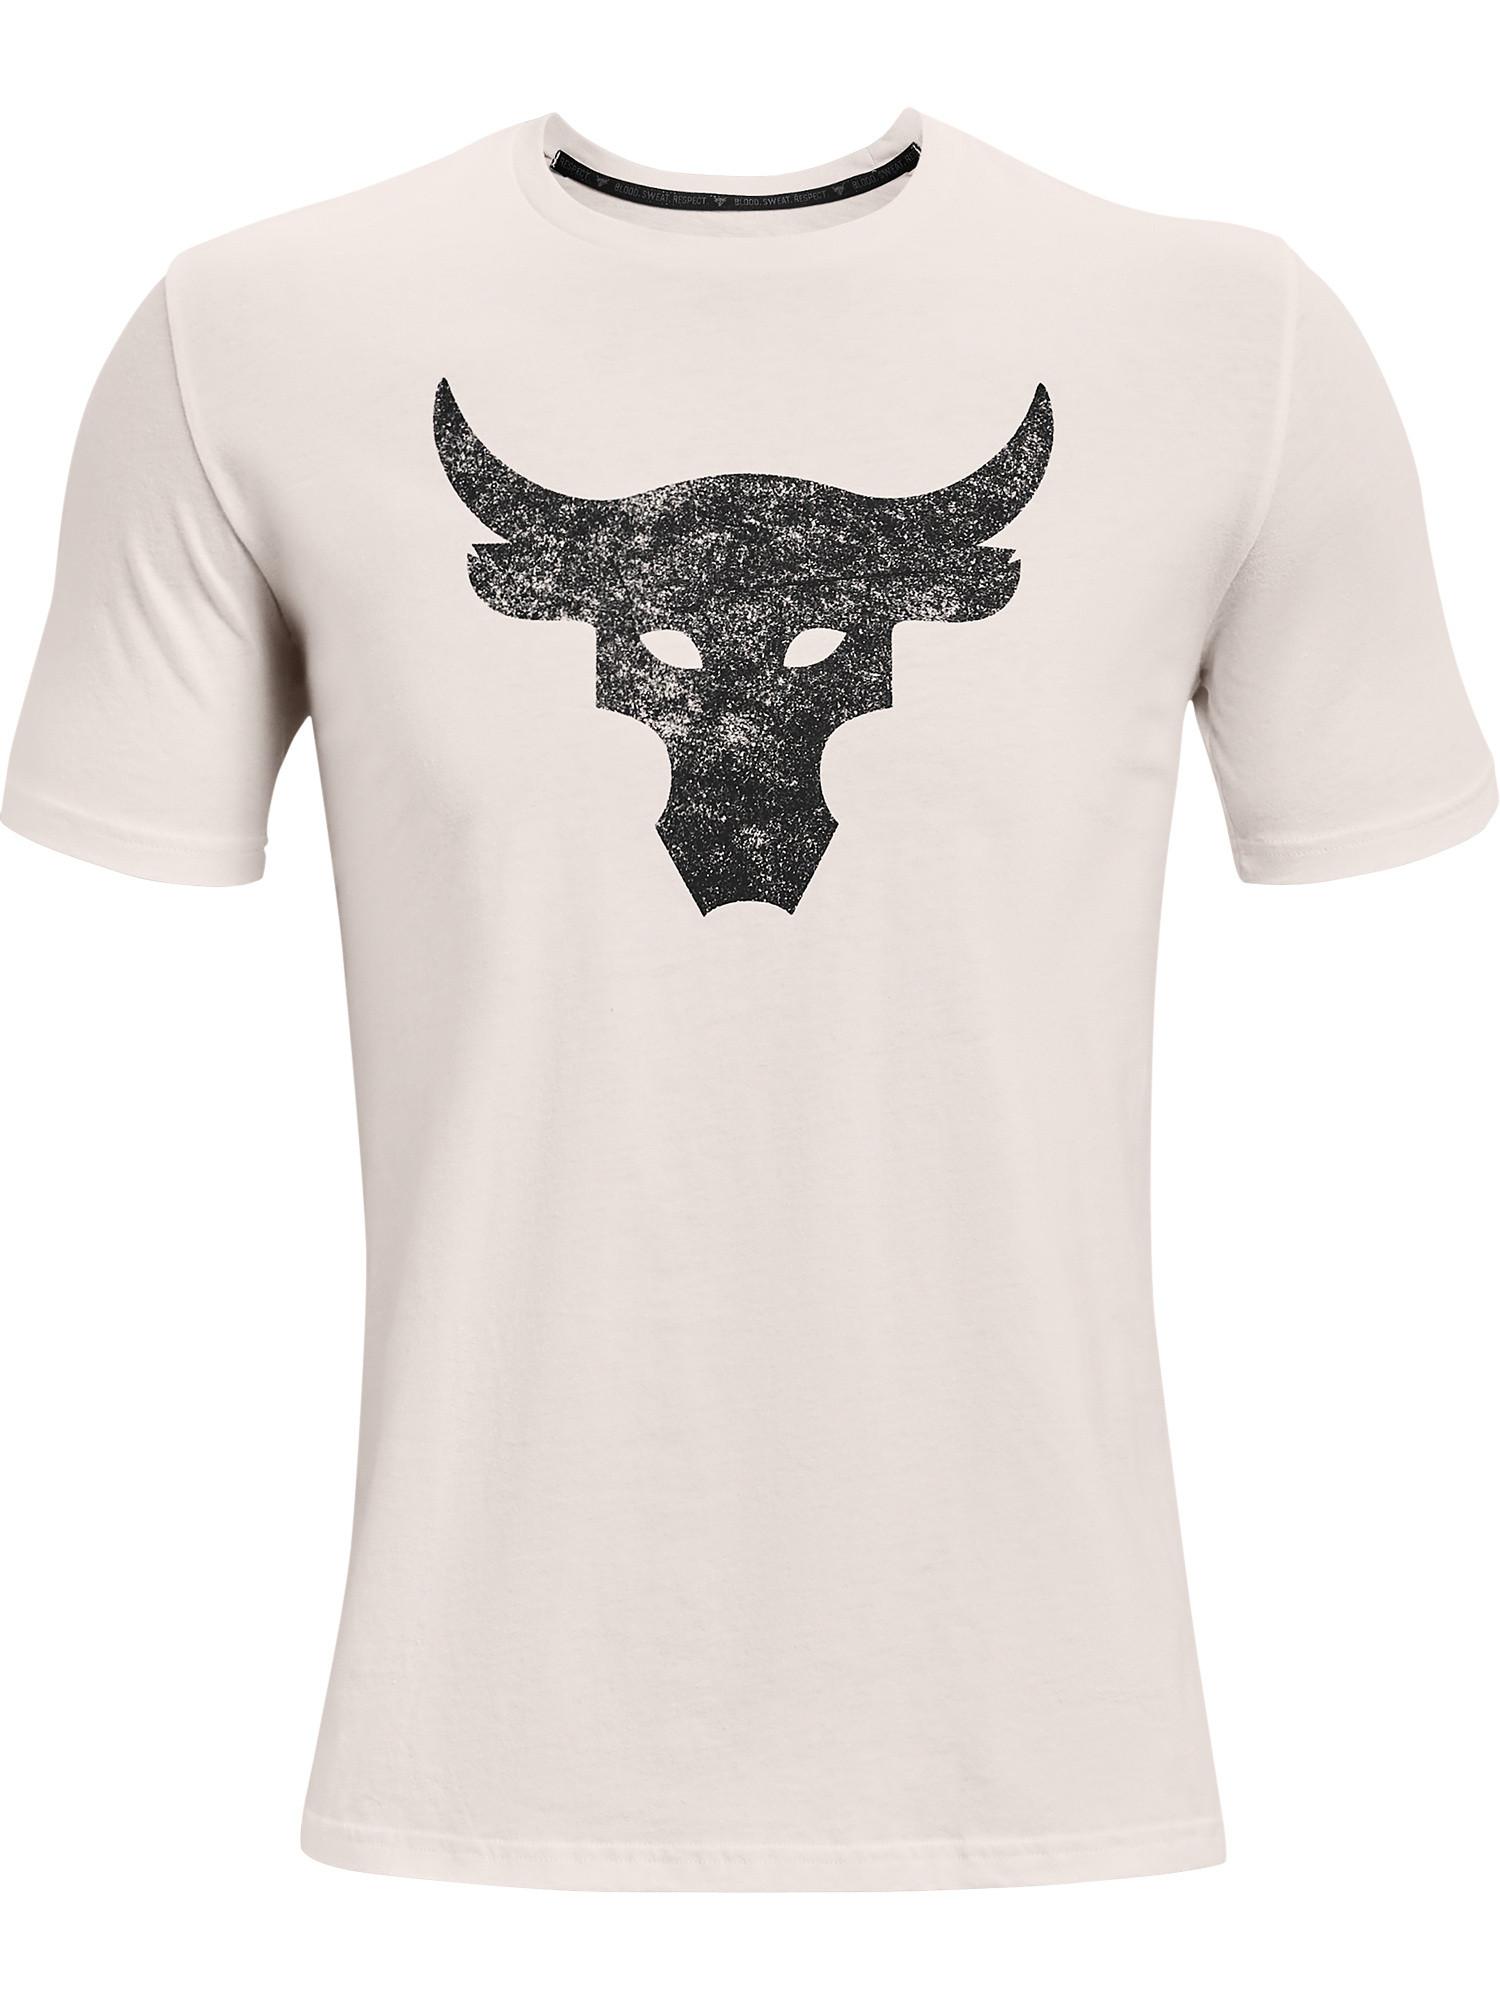 Maglia a manica corta Project Rock Brahma Bull da uomo, Bianco, large image number 0